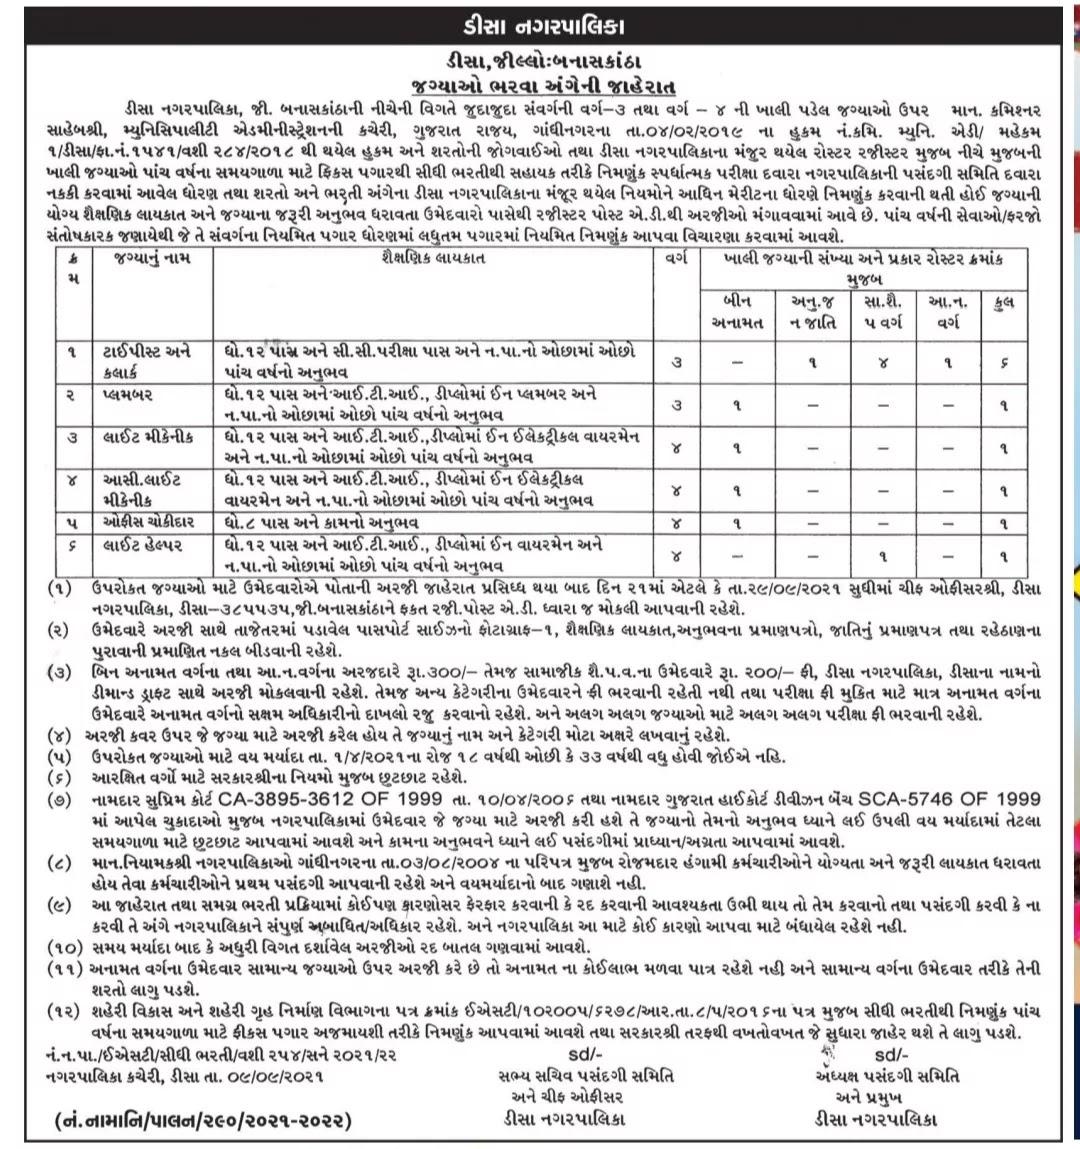 Deesa Nagarpalika Clerk & Typist & other posts recruitment 2021